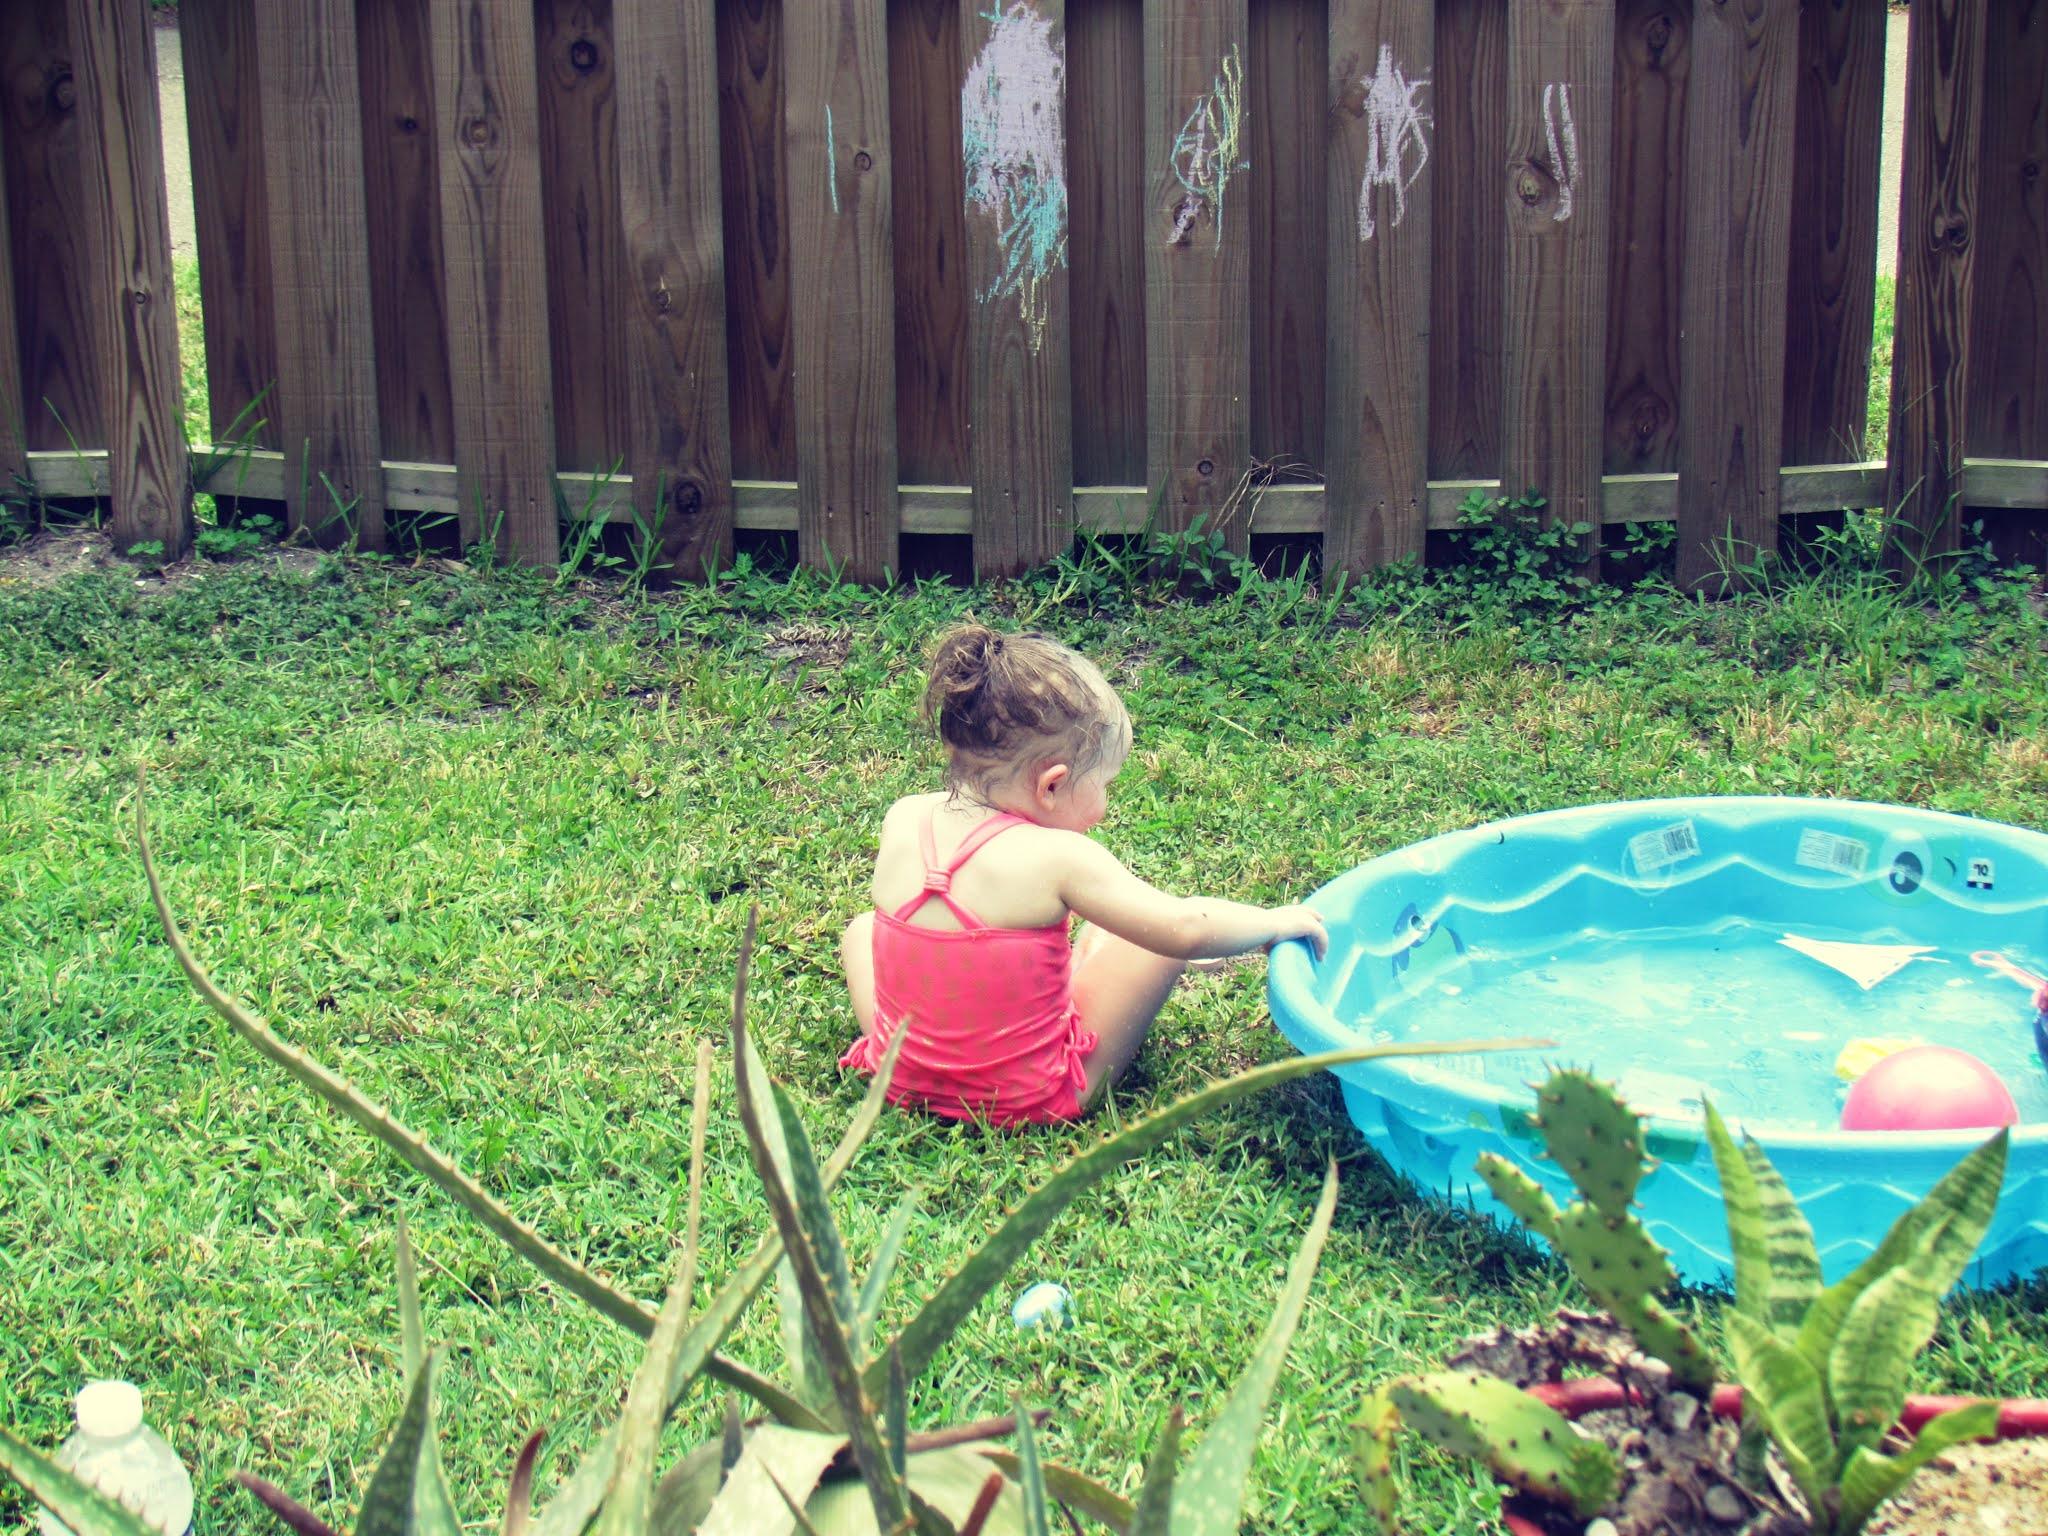 Backyard with girls baby toys, novelty toys, summer beach toys